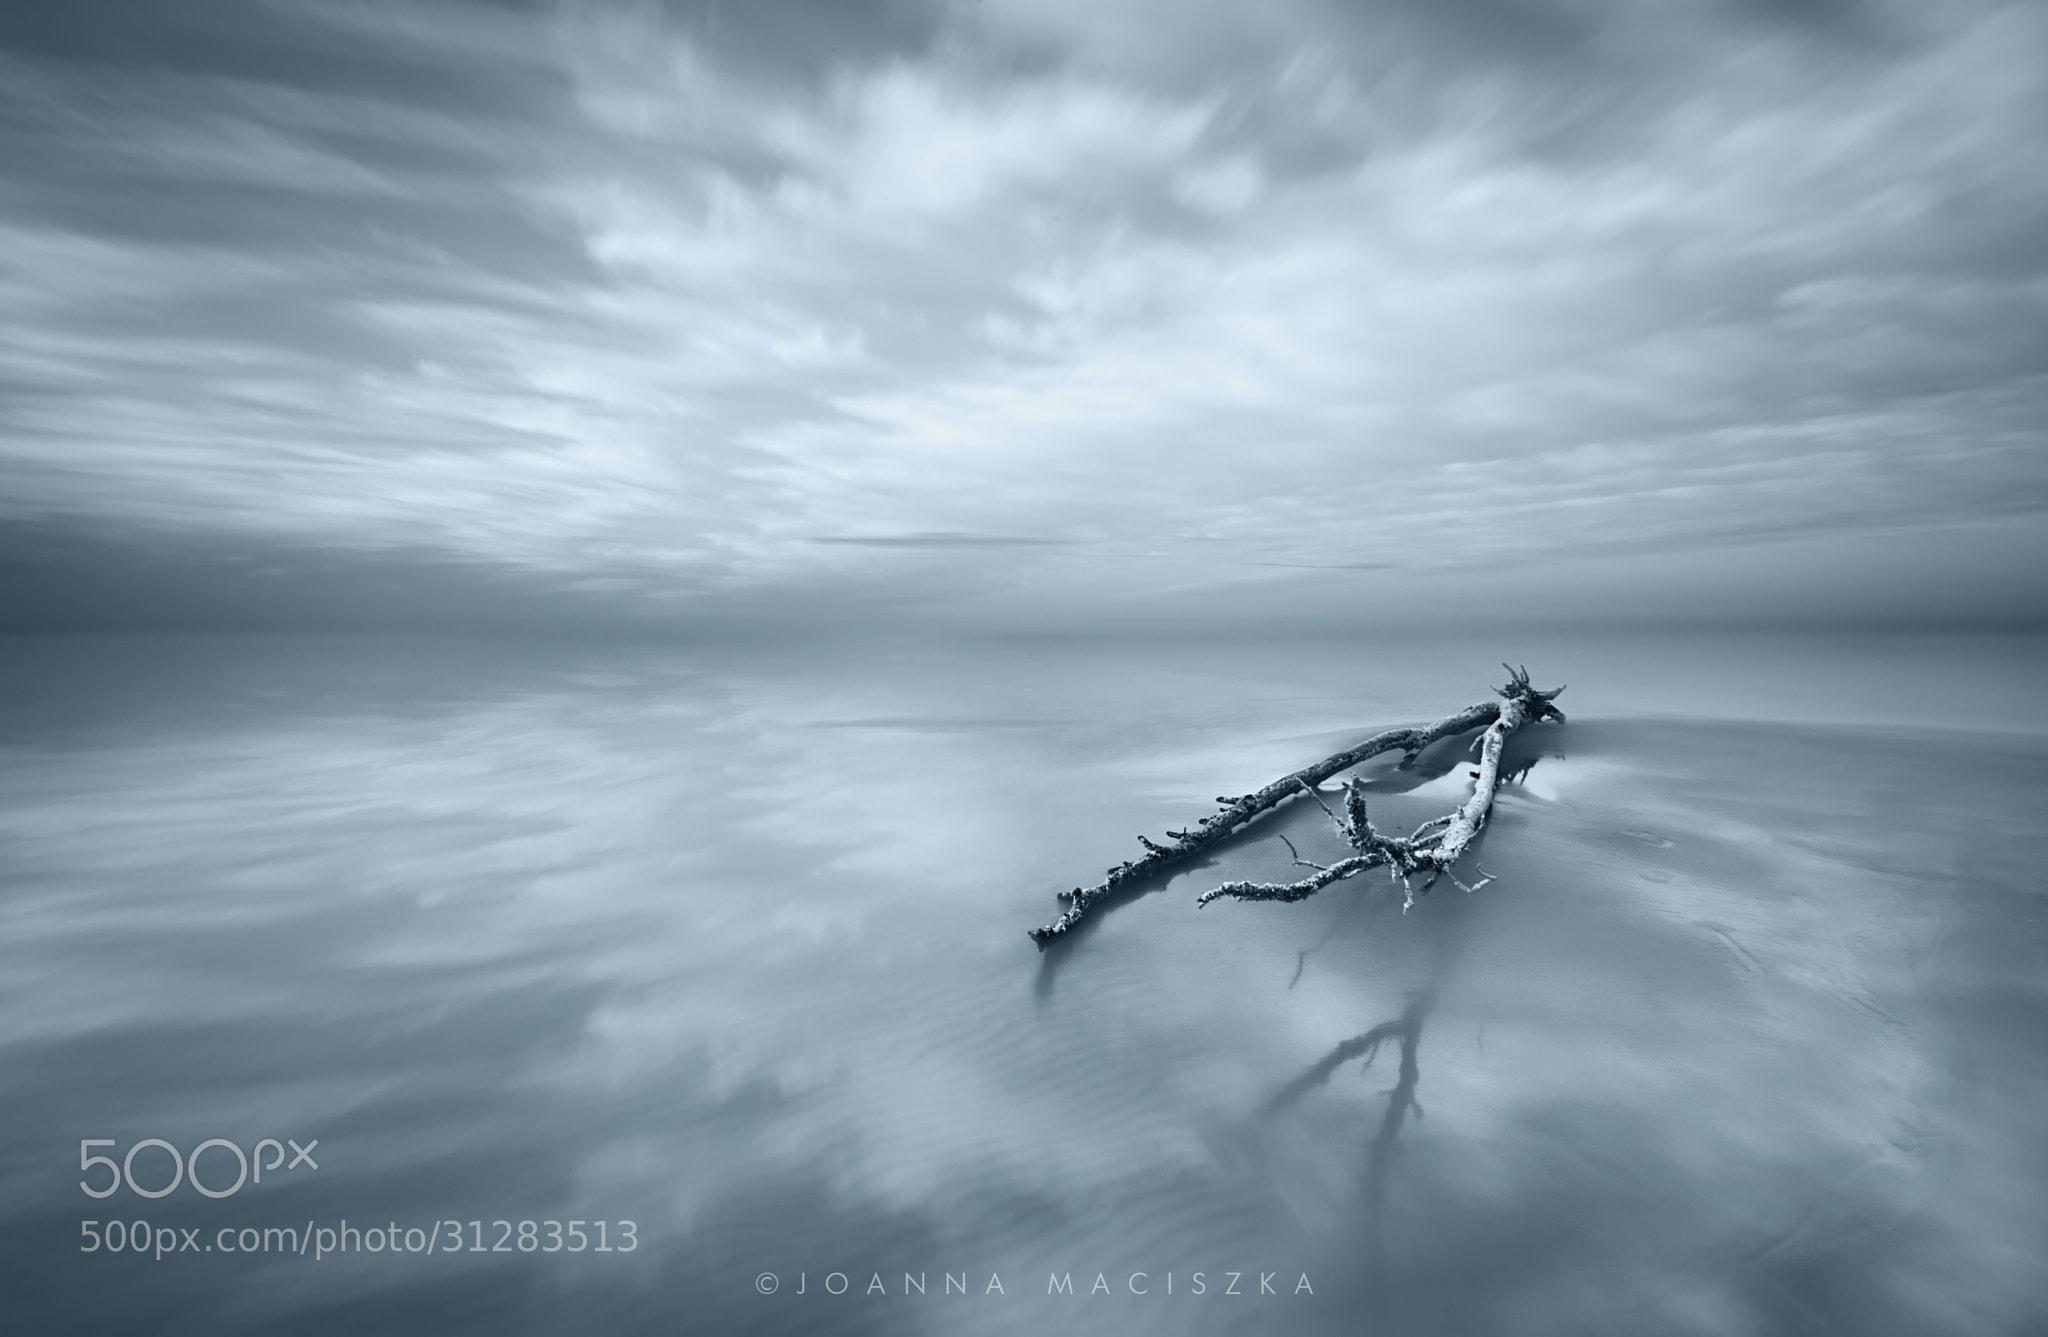 Photograph Infinity ... by Joanna Maciszka on 500px